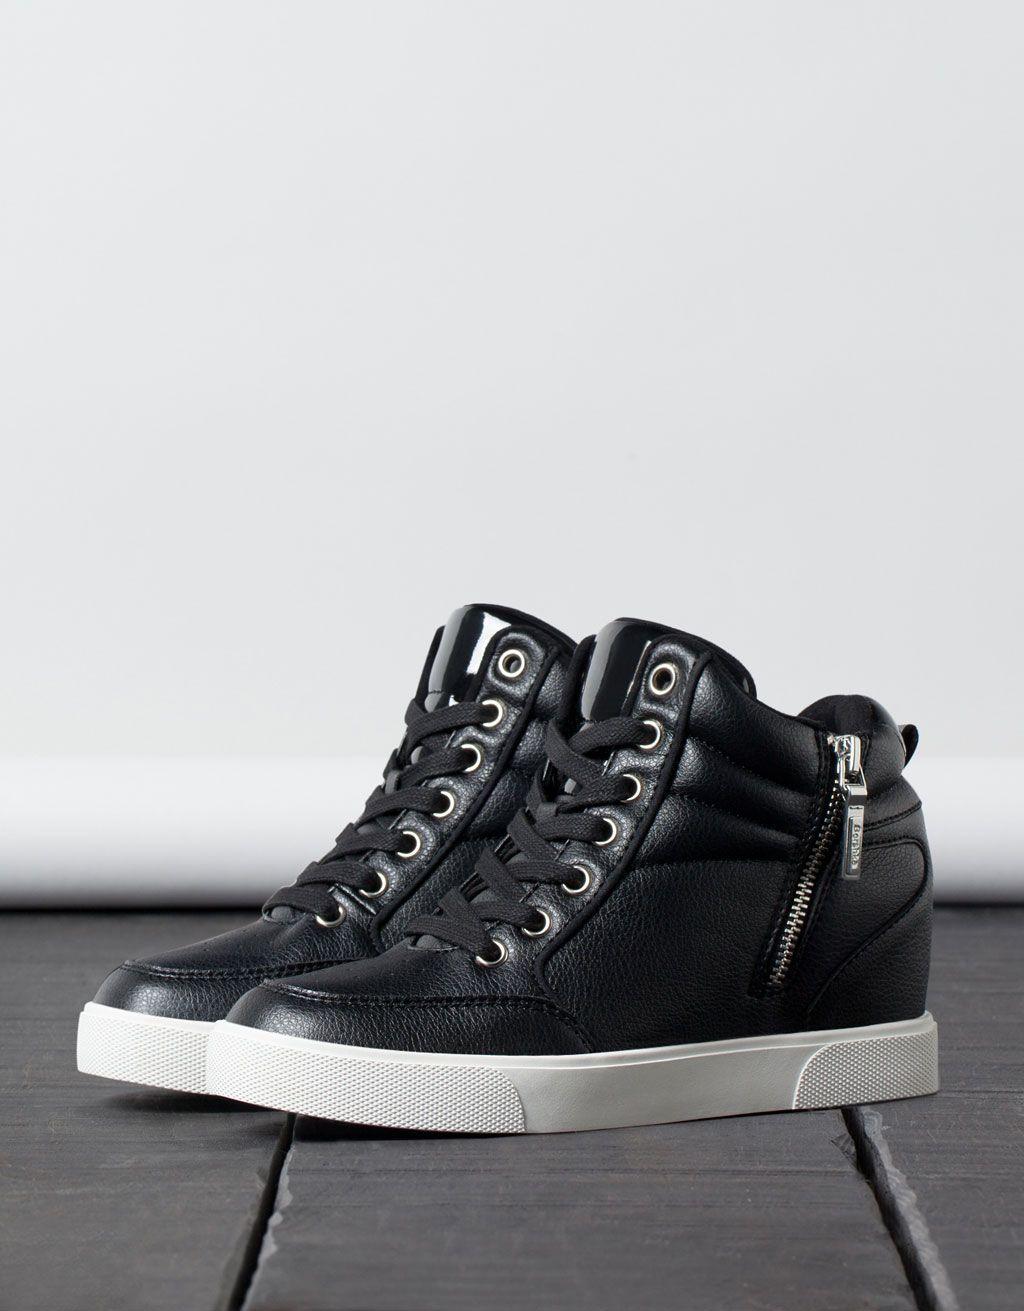 67c7aa0c27b BSK Bershka shoes pinterestcom